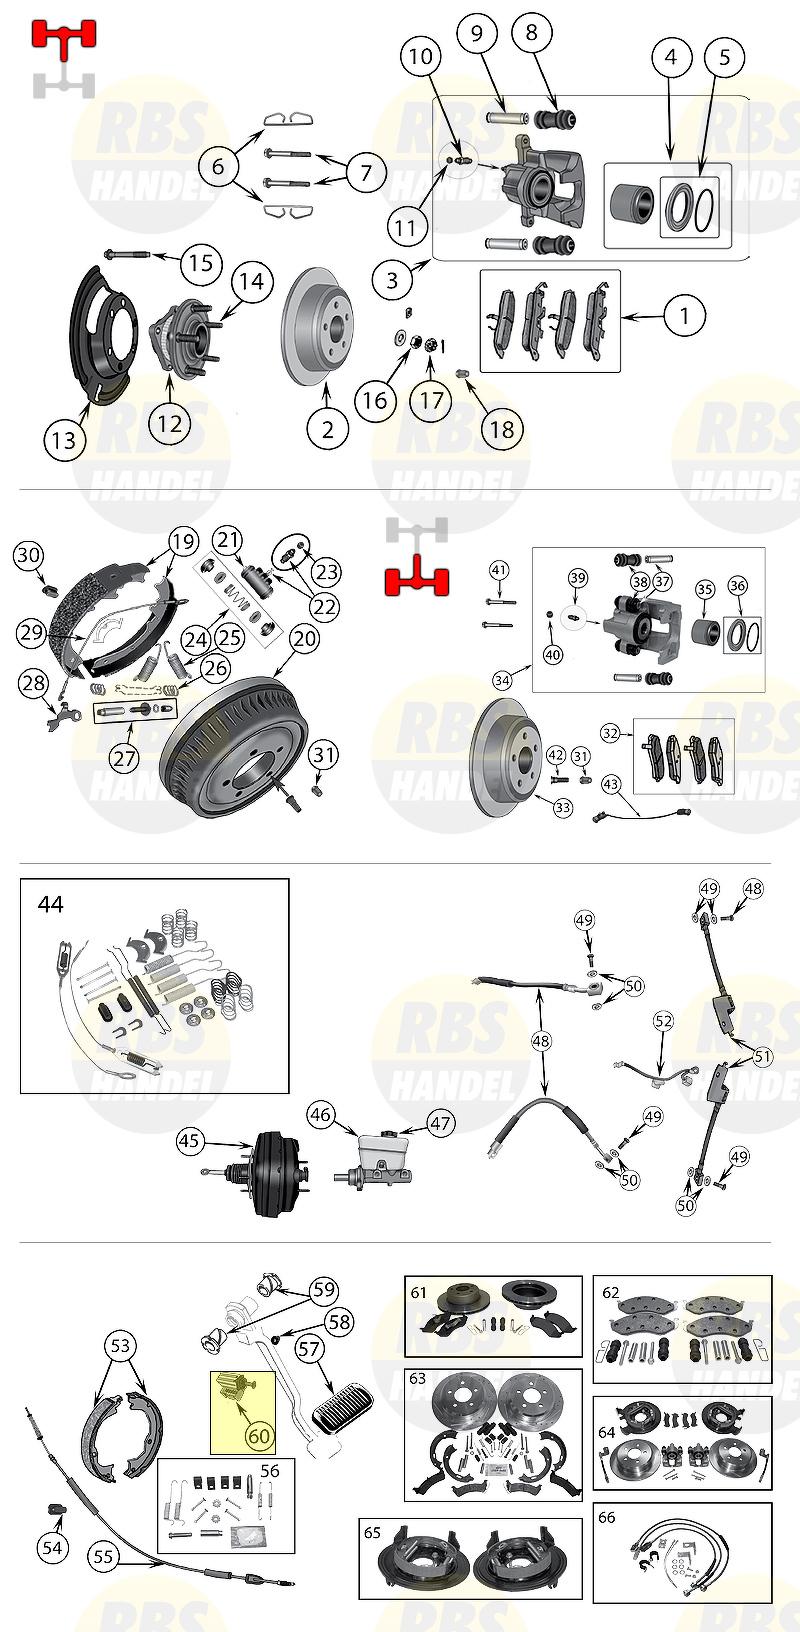 56006981 2.1 L, 2.5 L, 4.0 L Bremslichtschalter Jeep XJ Cherokee ...